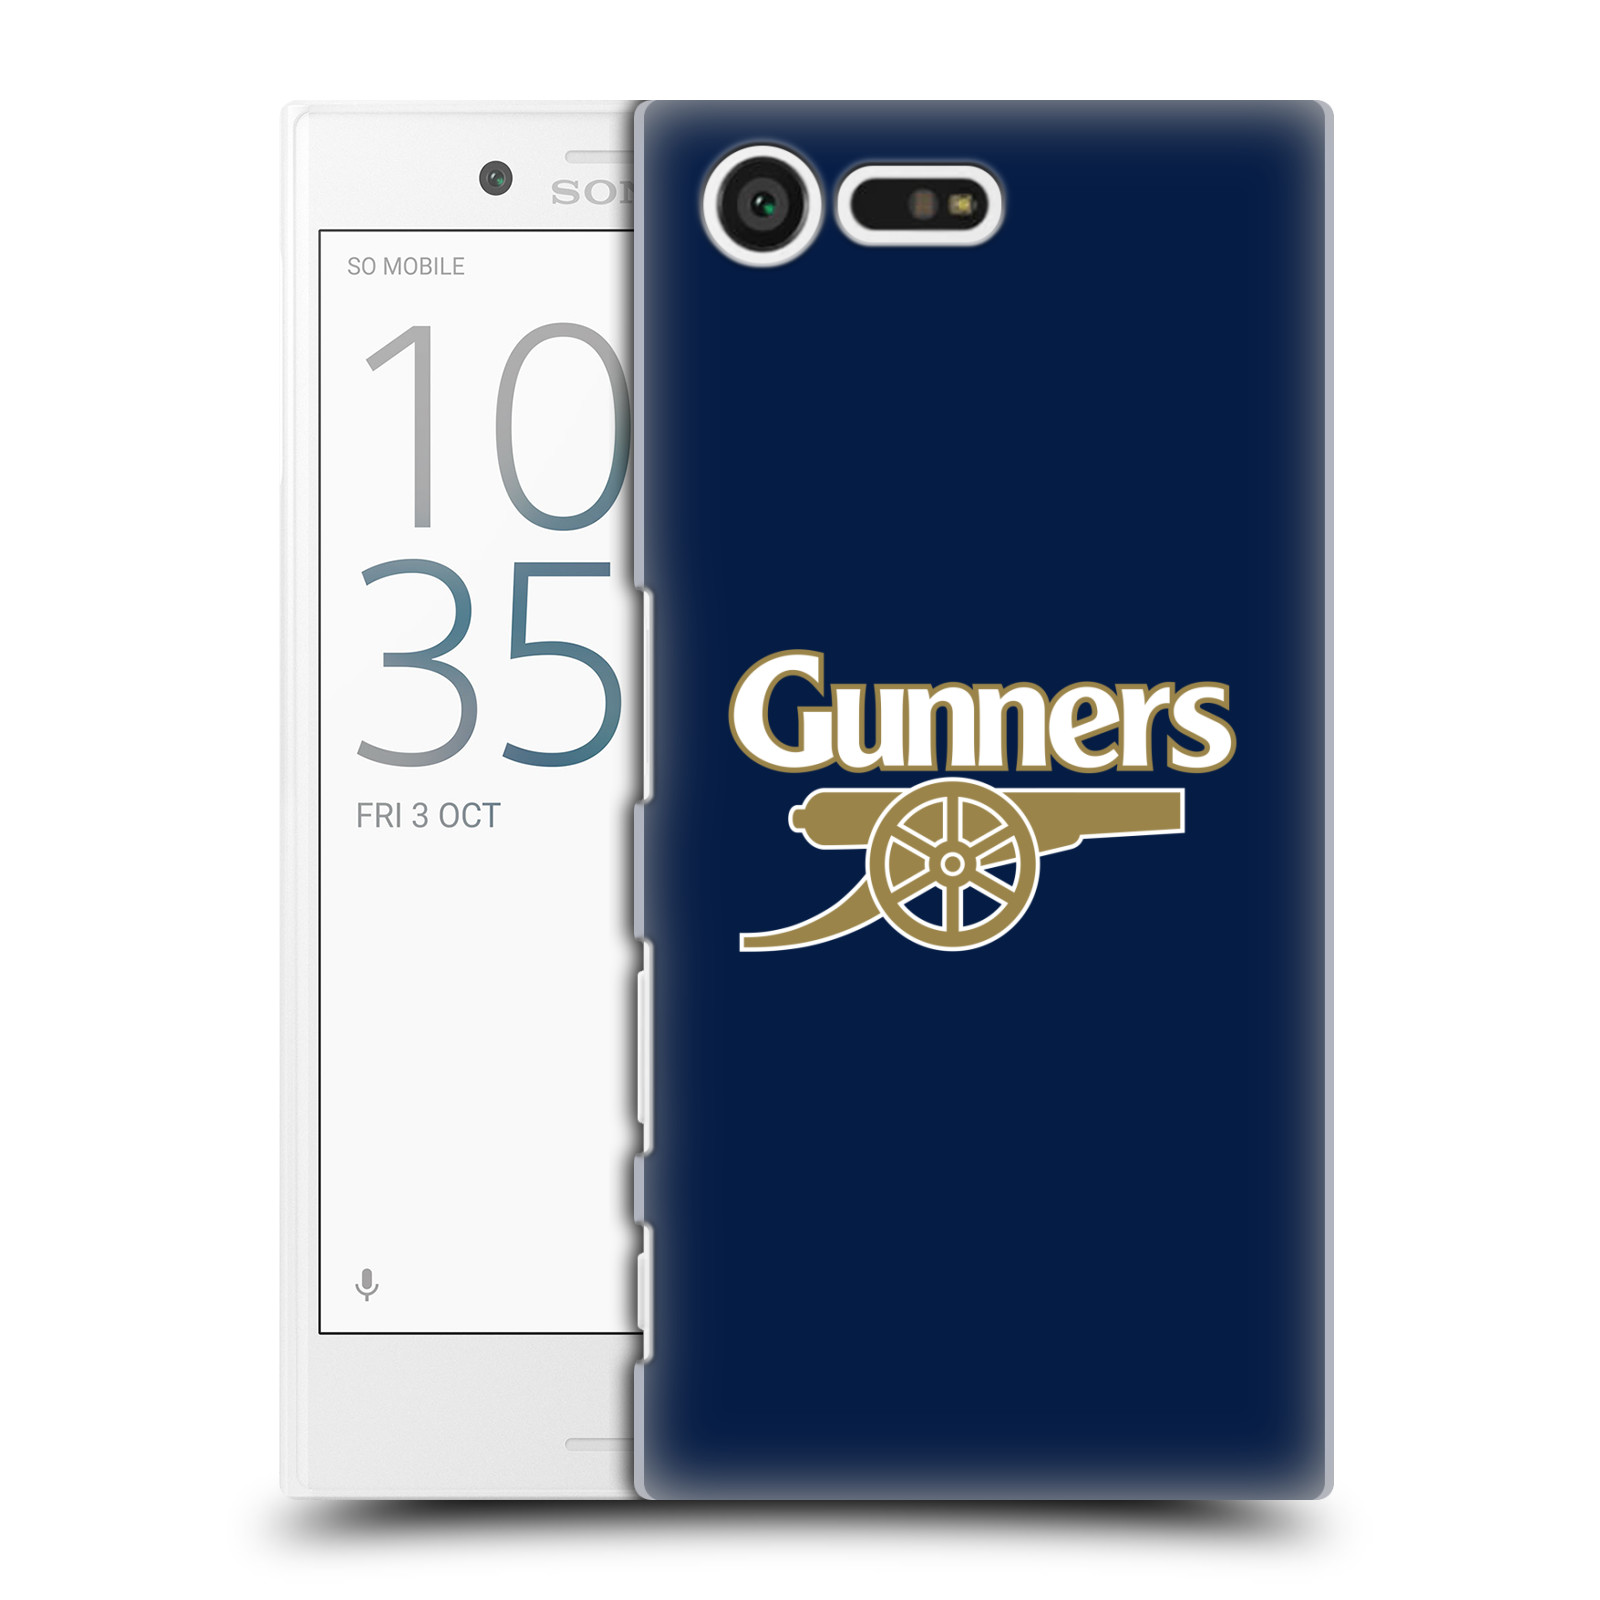 Plastové pouzdro na mobil Sony Xperia X Compact - Head Case - Arsenal FC - Gunners